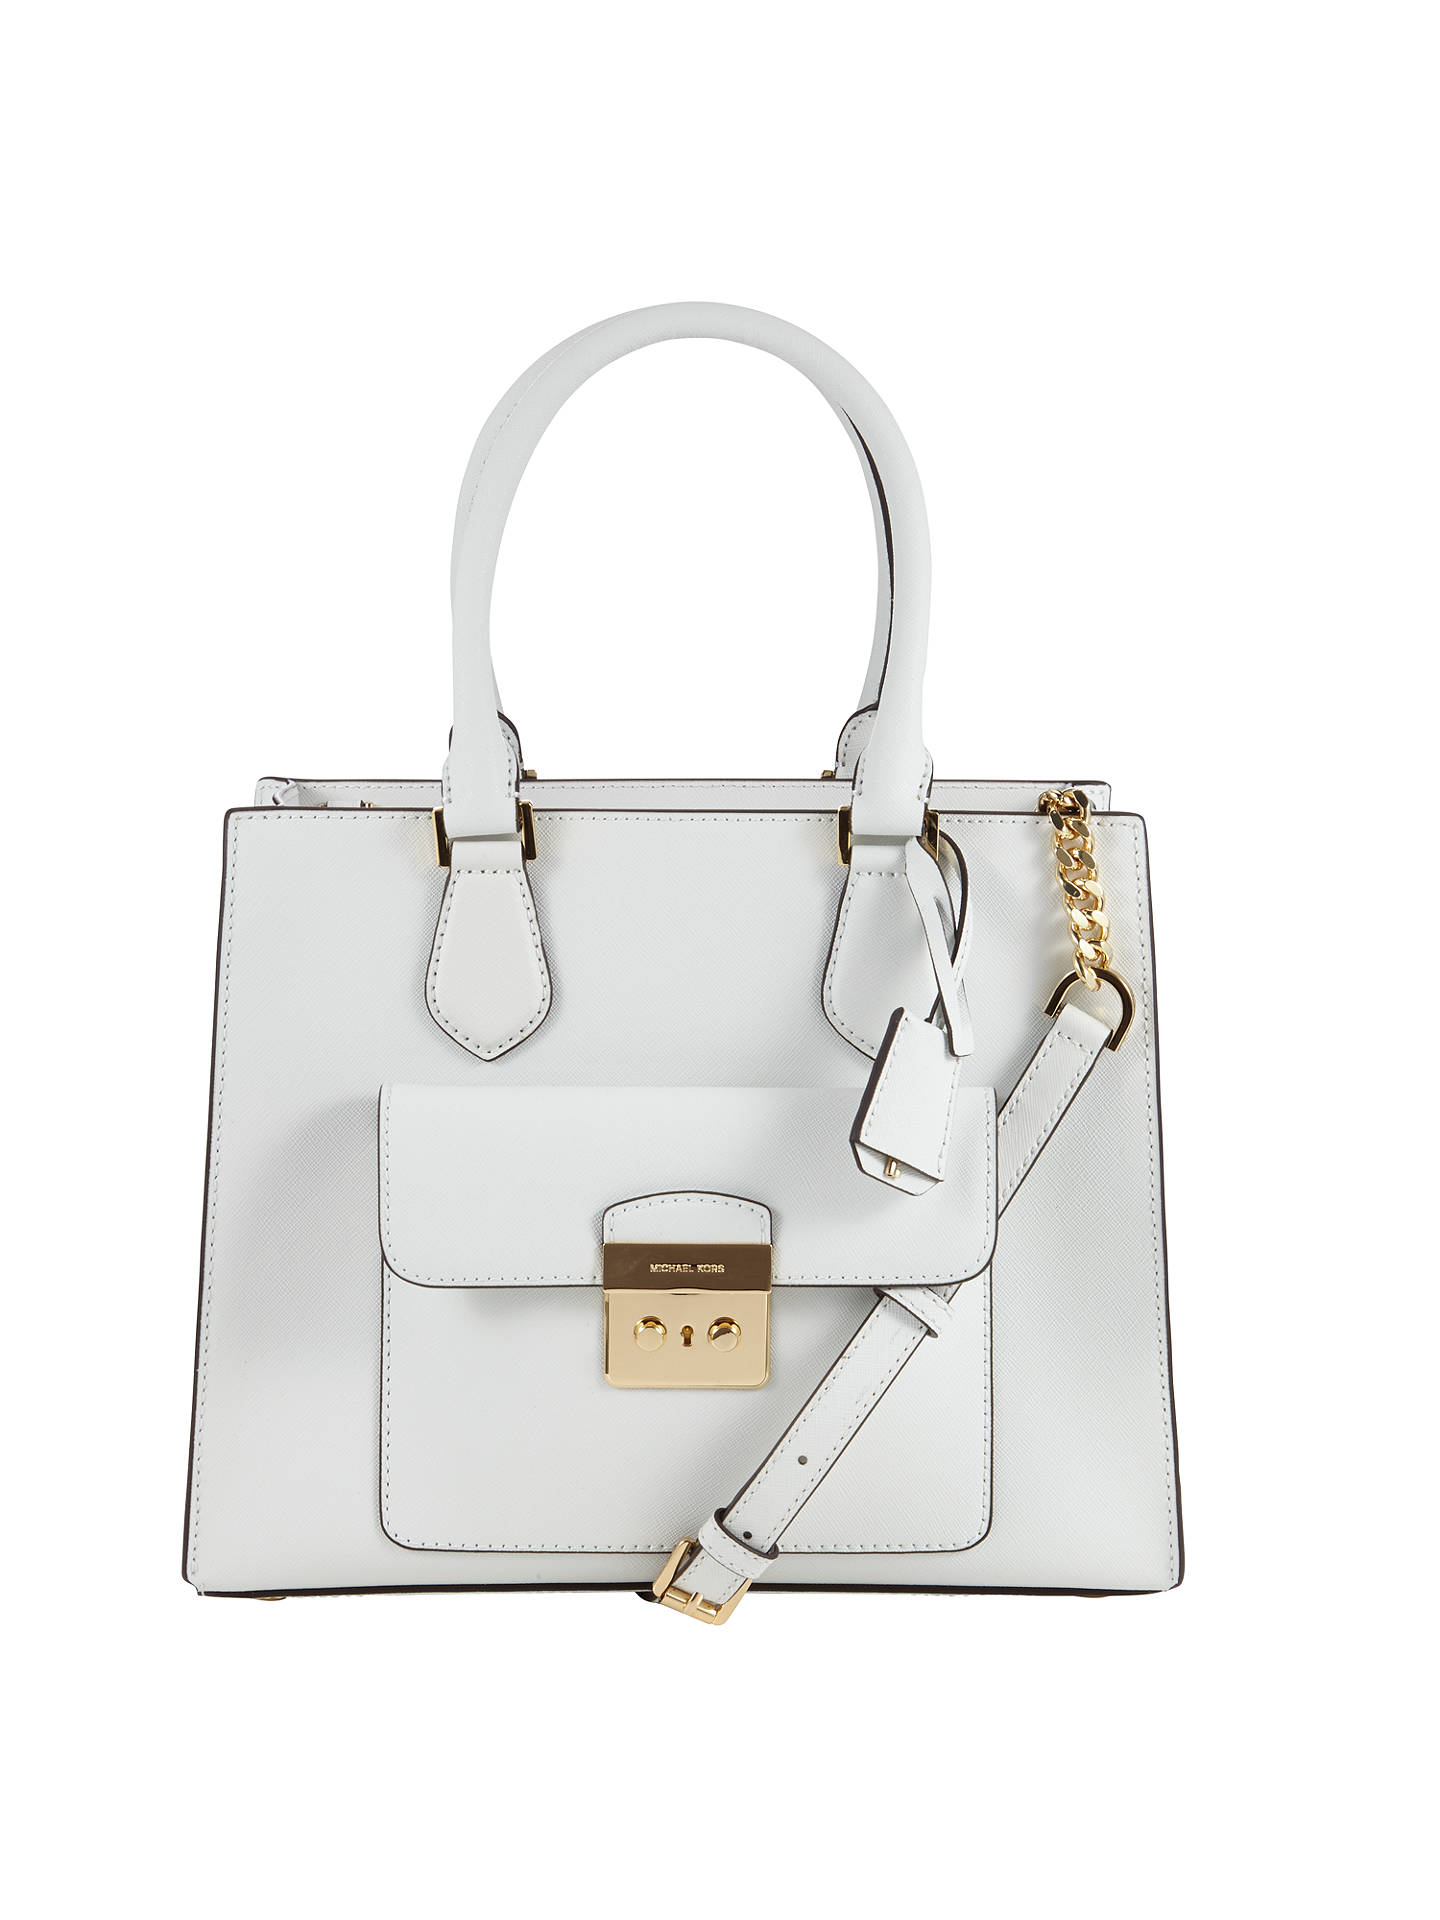 47978a3be3e4 Buy MICHAEL Michael Kors Bridgette Medium Tote Bag, Optic White Online at  johnlewis.com ...